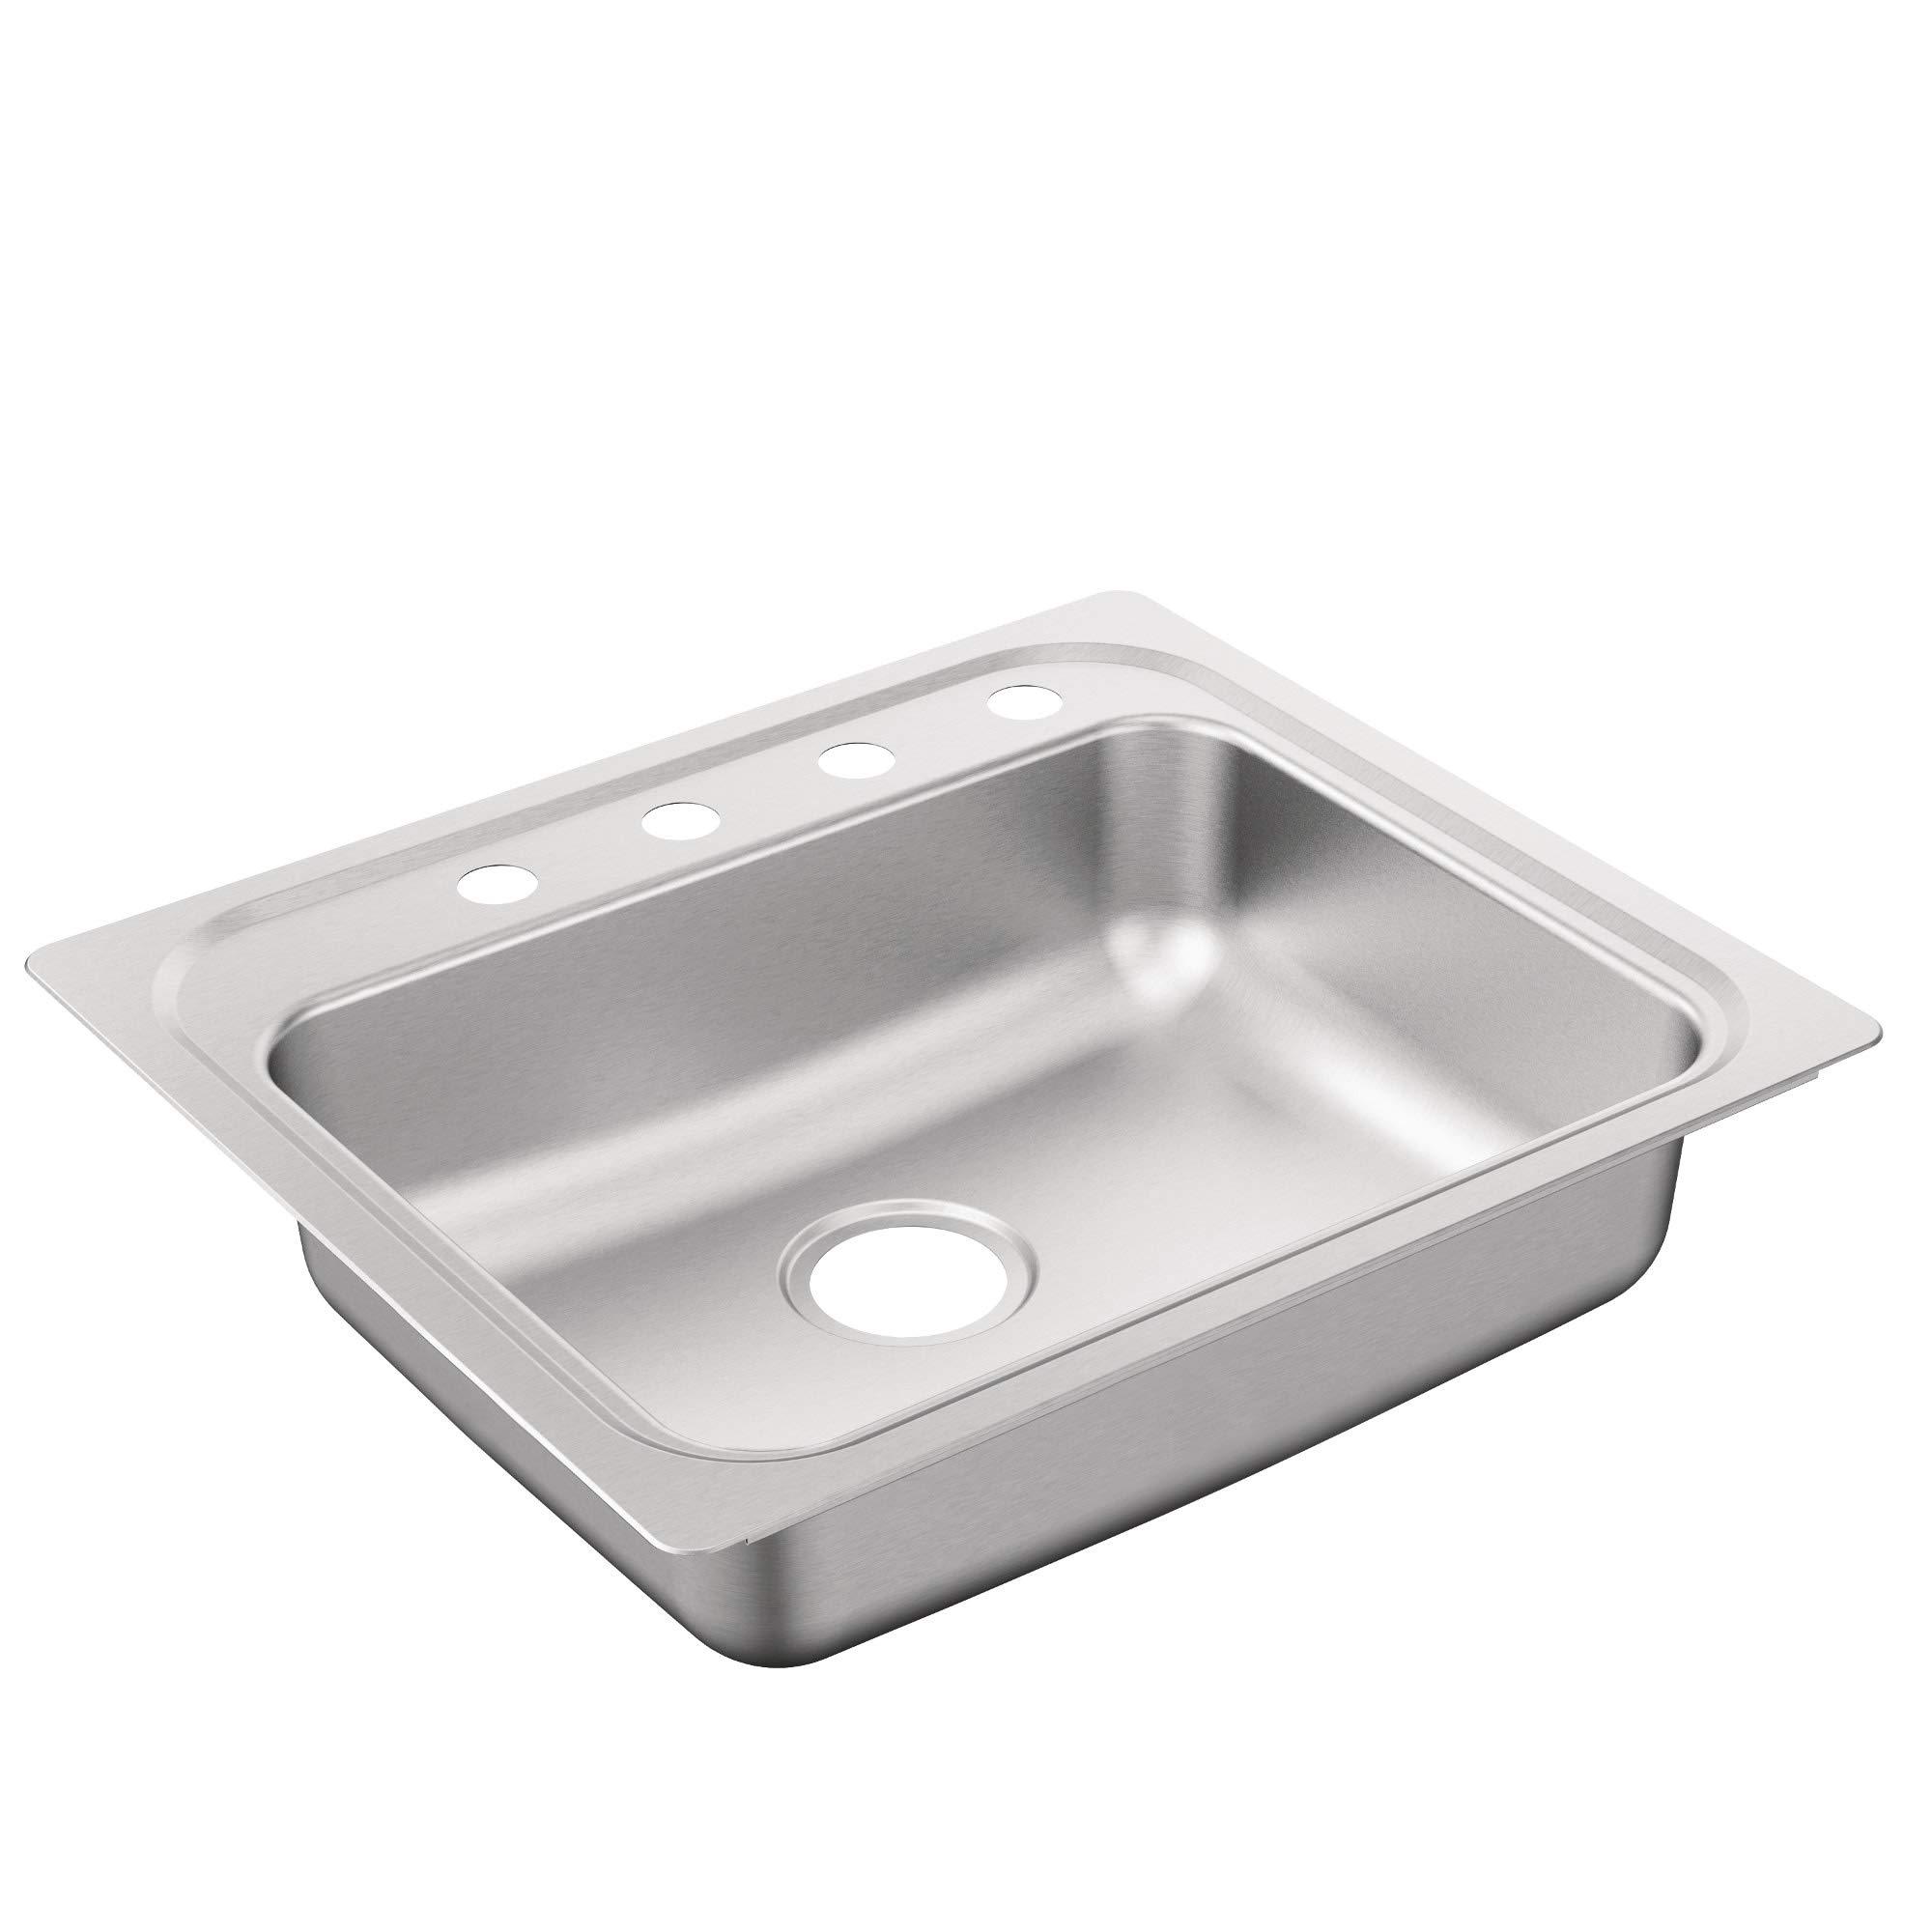 Moen G221984B 2200 Series Sink Brushed/Satin Stainless